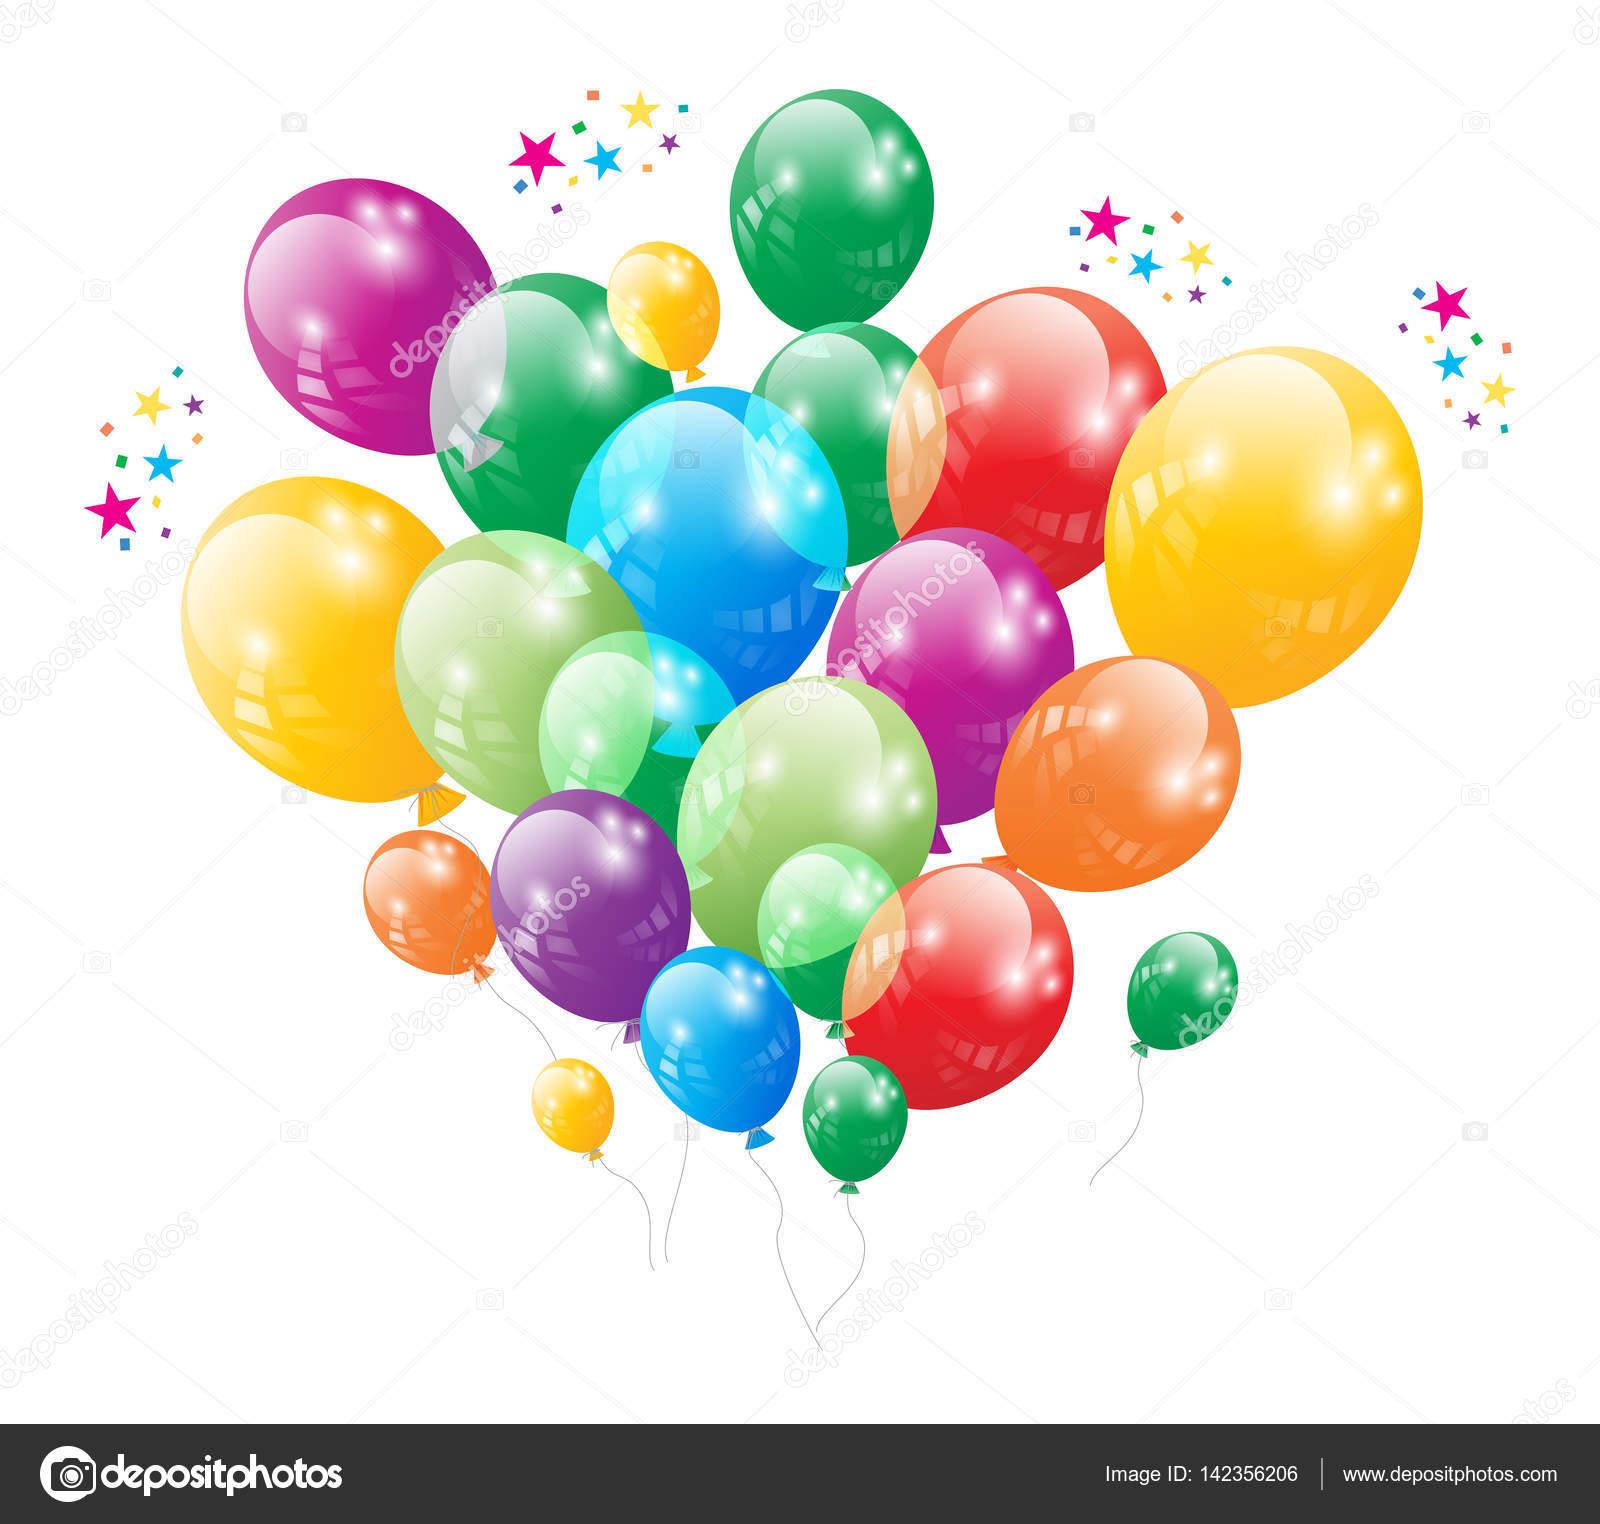 Geburtstag Party Ballon Vektor Stockvektor C Bagiuiani 142356206